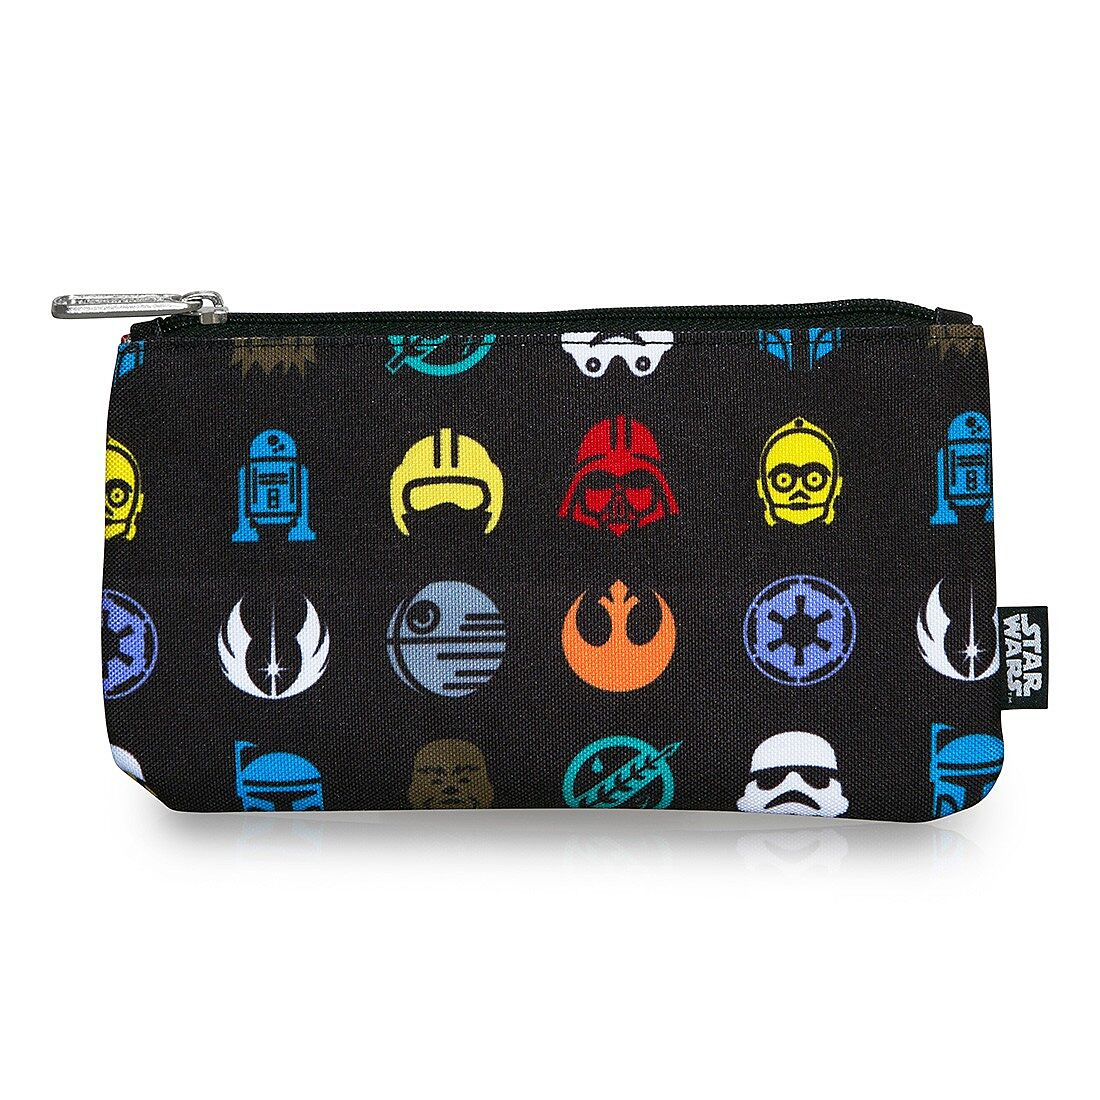 46b639b2940 Star Wars Multi Symbol Print Coin Cosmetic Bag –  9.00. Image credit   Loungefly